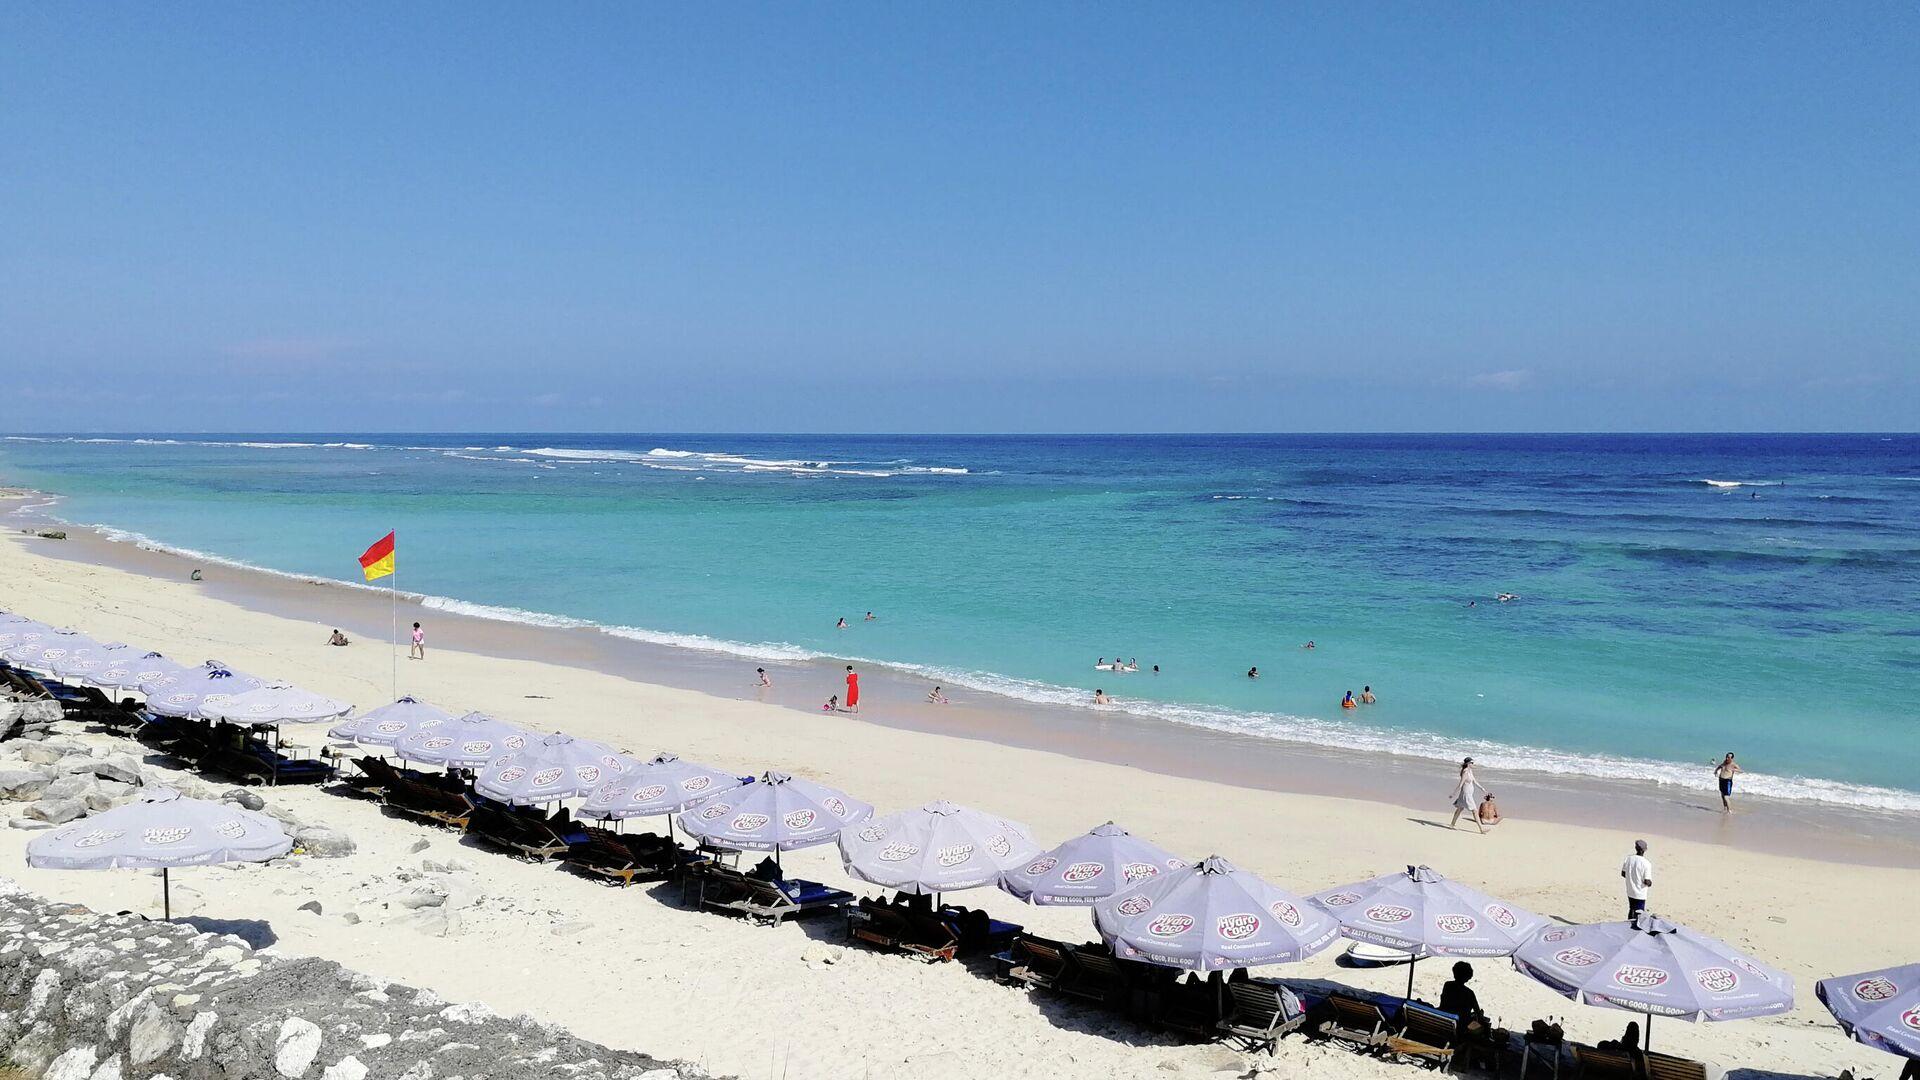 1563379119 0:257:2730:1793 1920x0 80 0 0 91e1589e100b861fbe2514f6c8589b80 - Иностранных туристов-нарушителей на Бали заставляют отжиматься